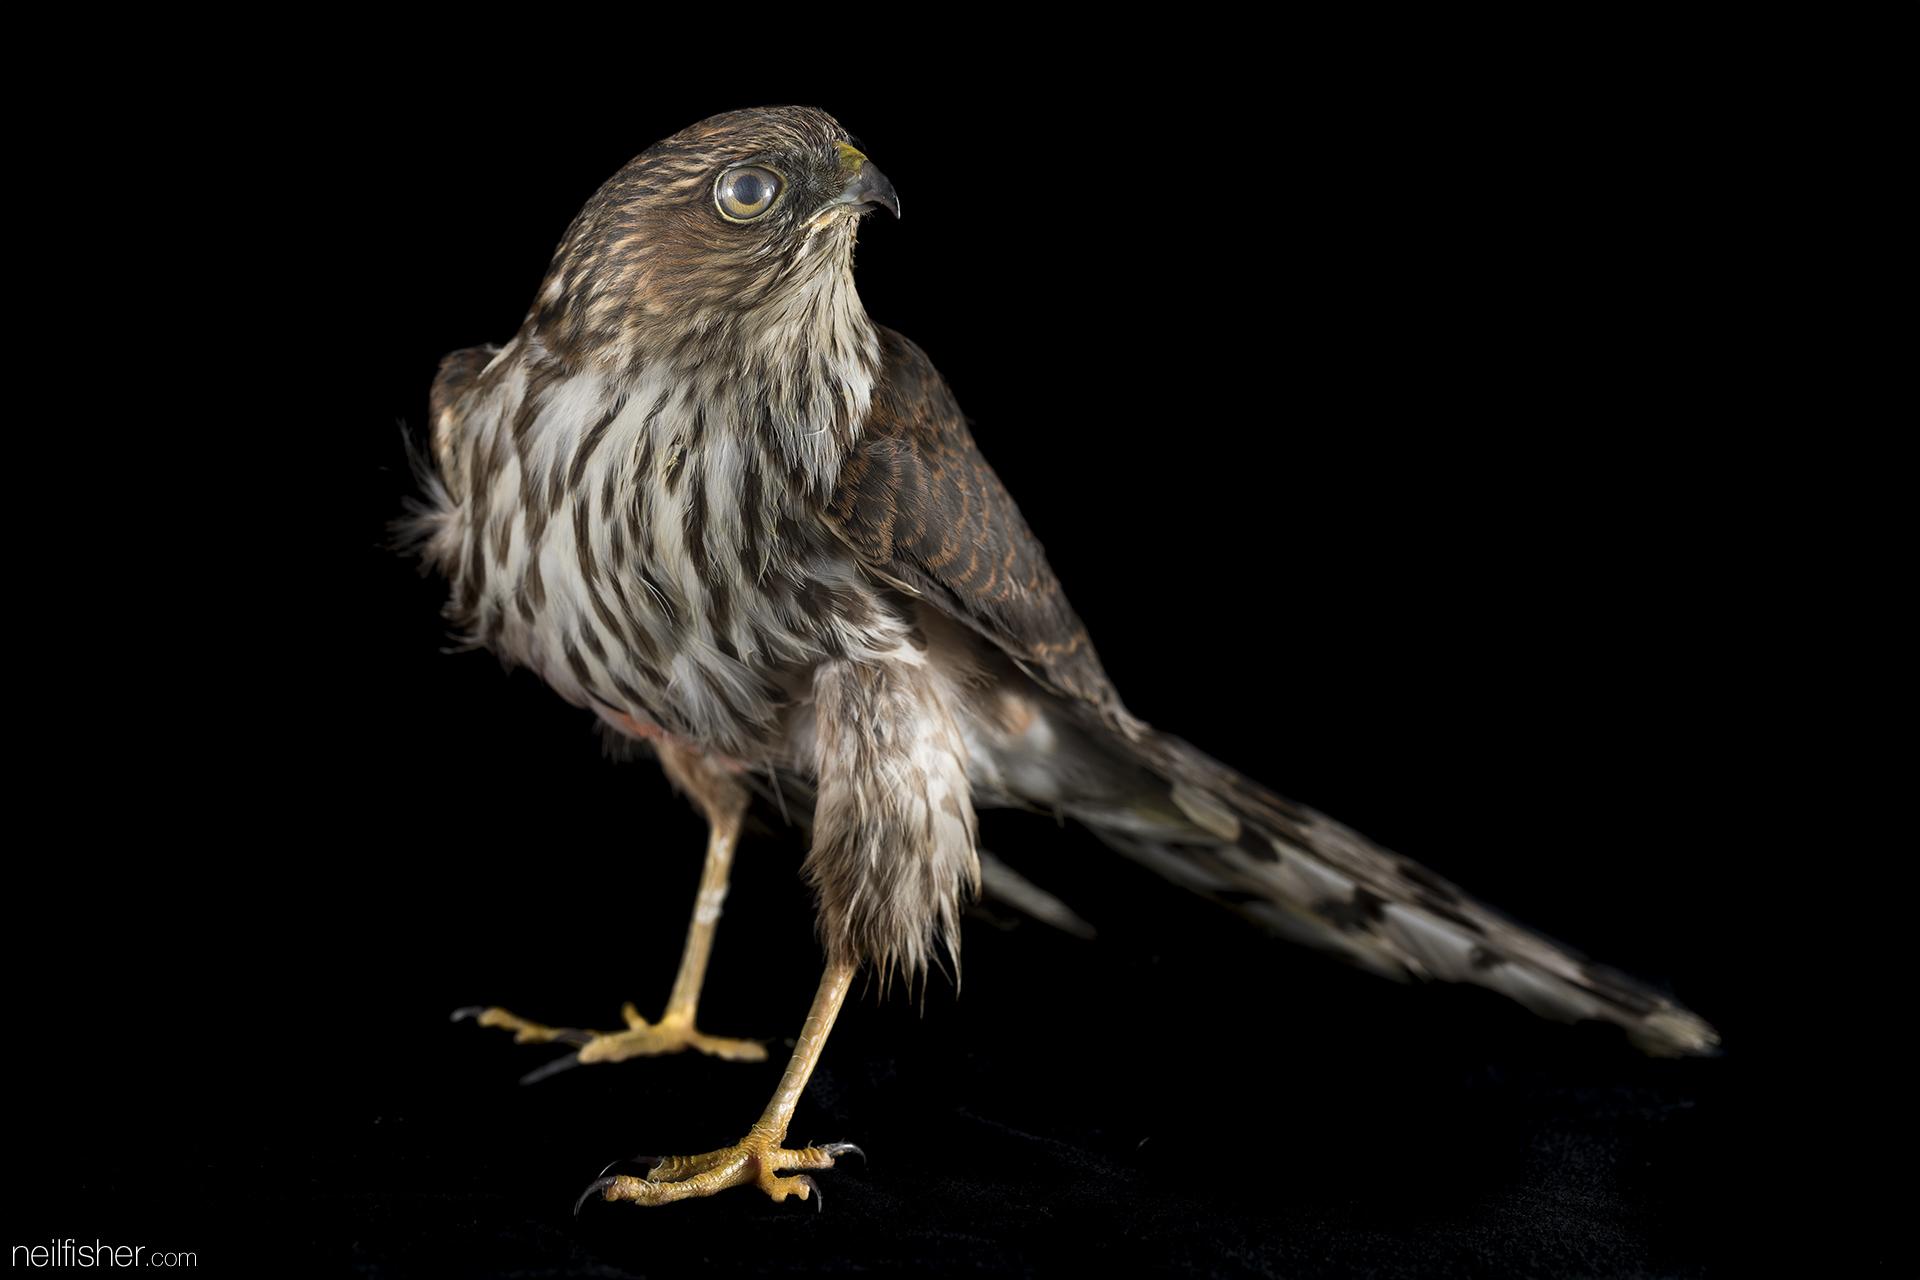 20171012 - Sharp-shinned Hawk (1) - NeilFisher.jpg